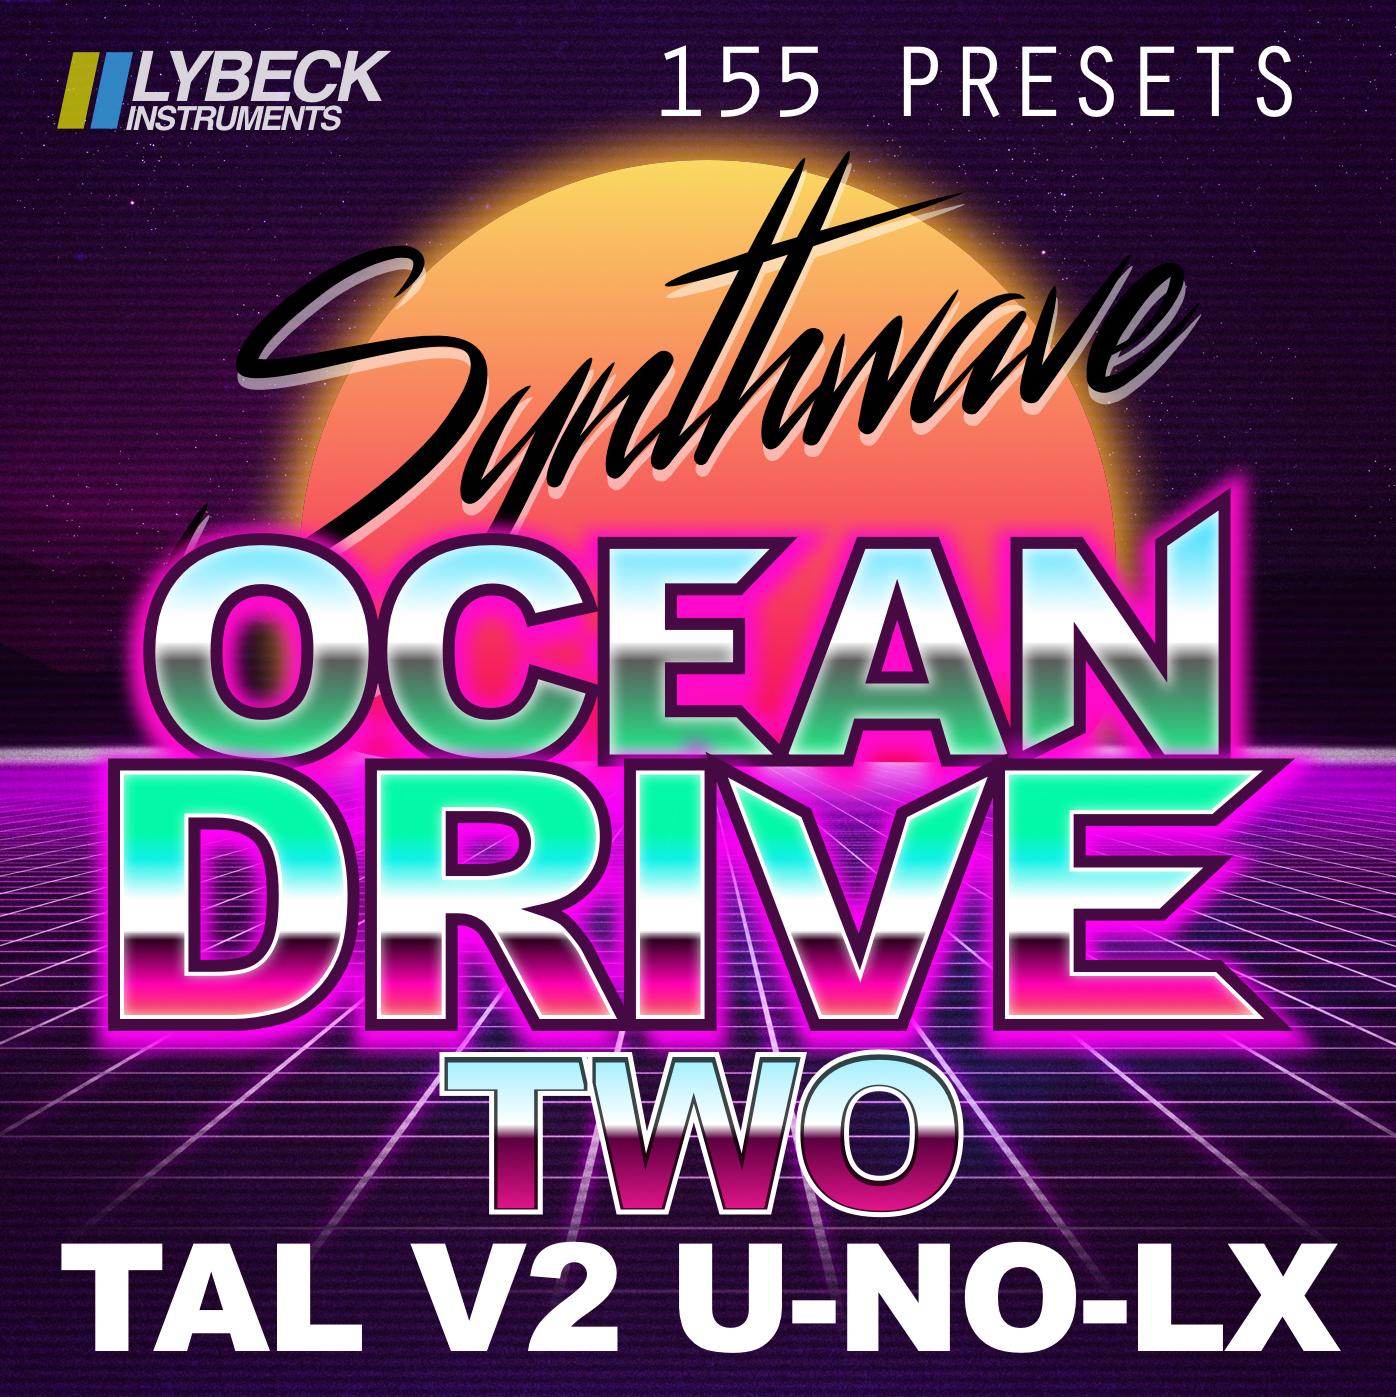 OCEAN DRIVE - TWO | Synthmob